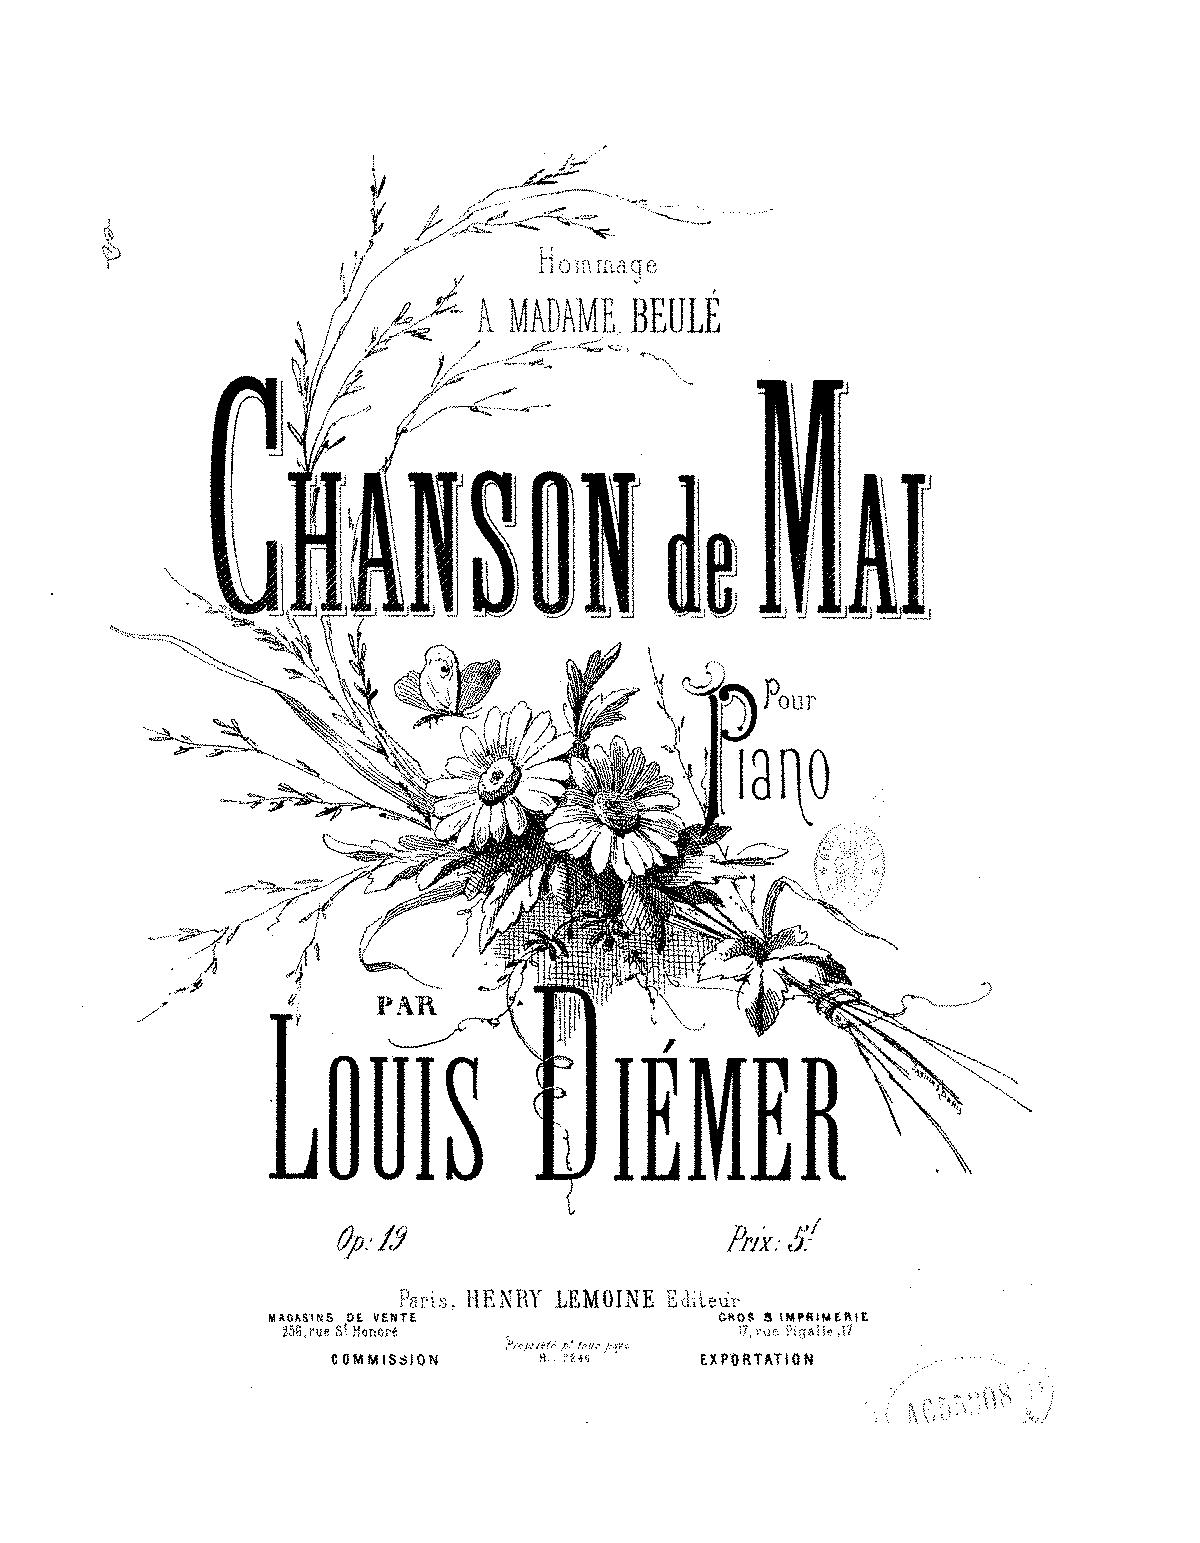 Chanson de mai, Op 19 (Diémer, Louis) - IMSLP/Petrucci Music Library